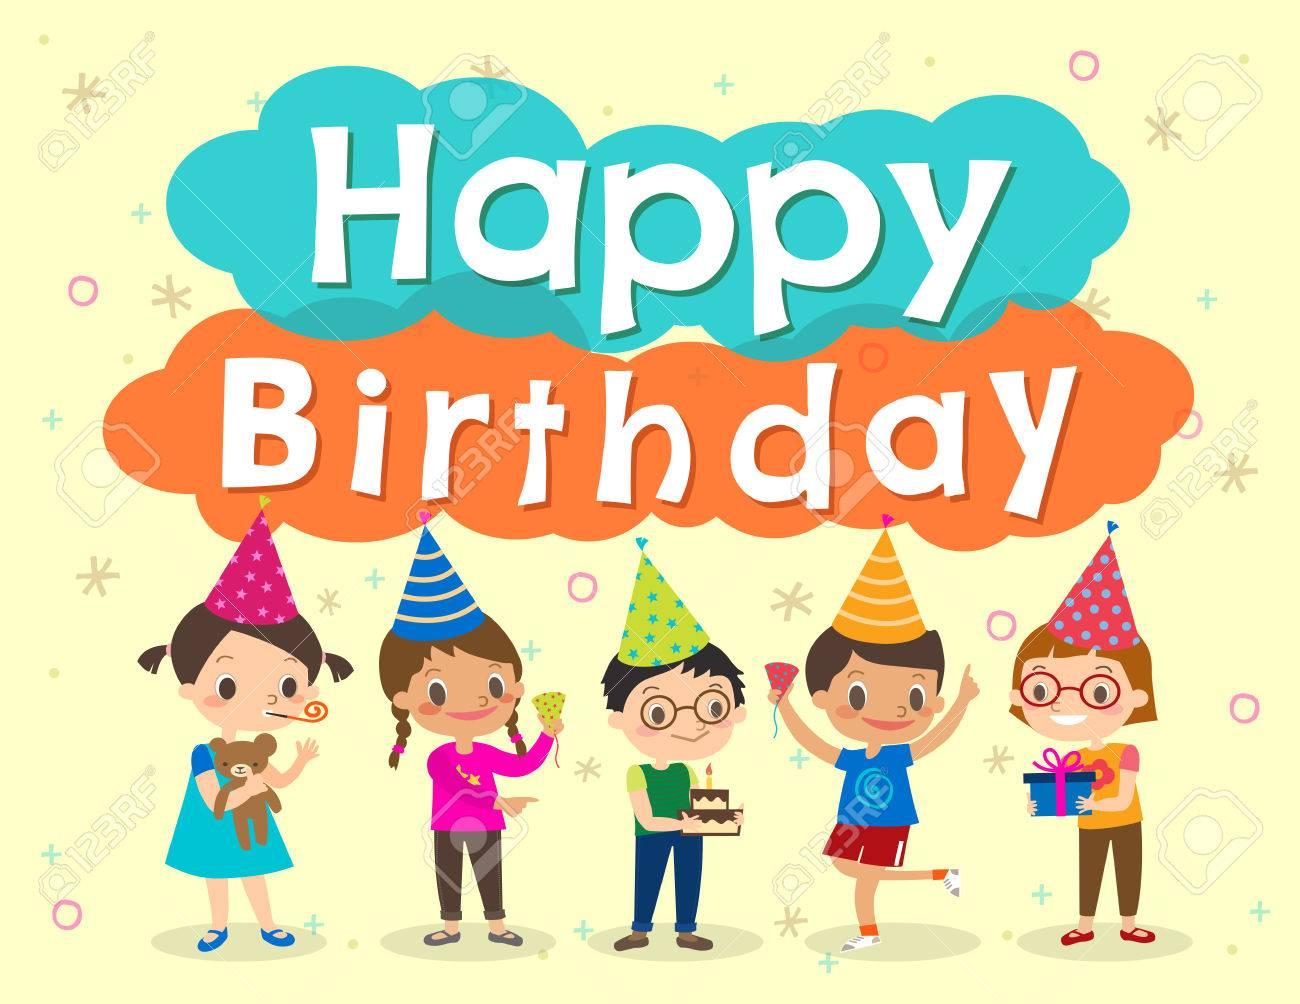 Happy Birthday Party Kids Cartoon Illustration Design Template Stock Vector